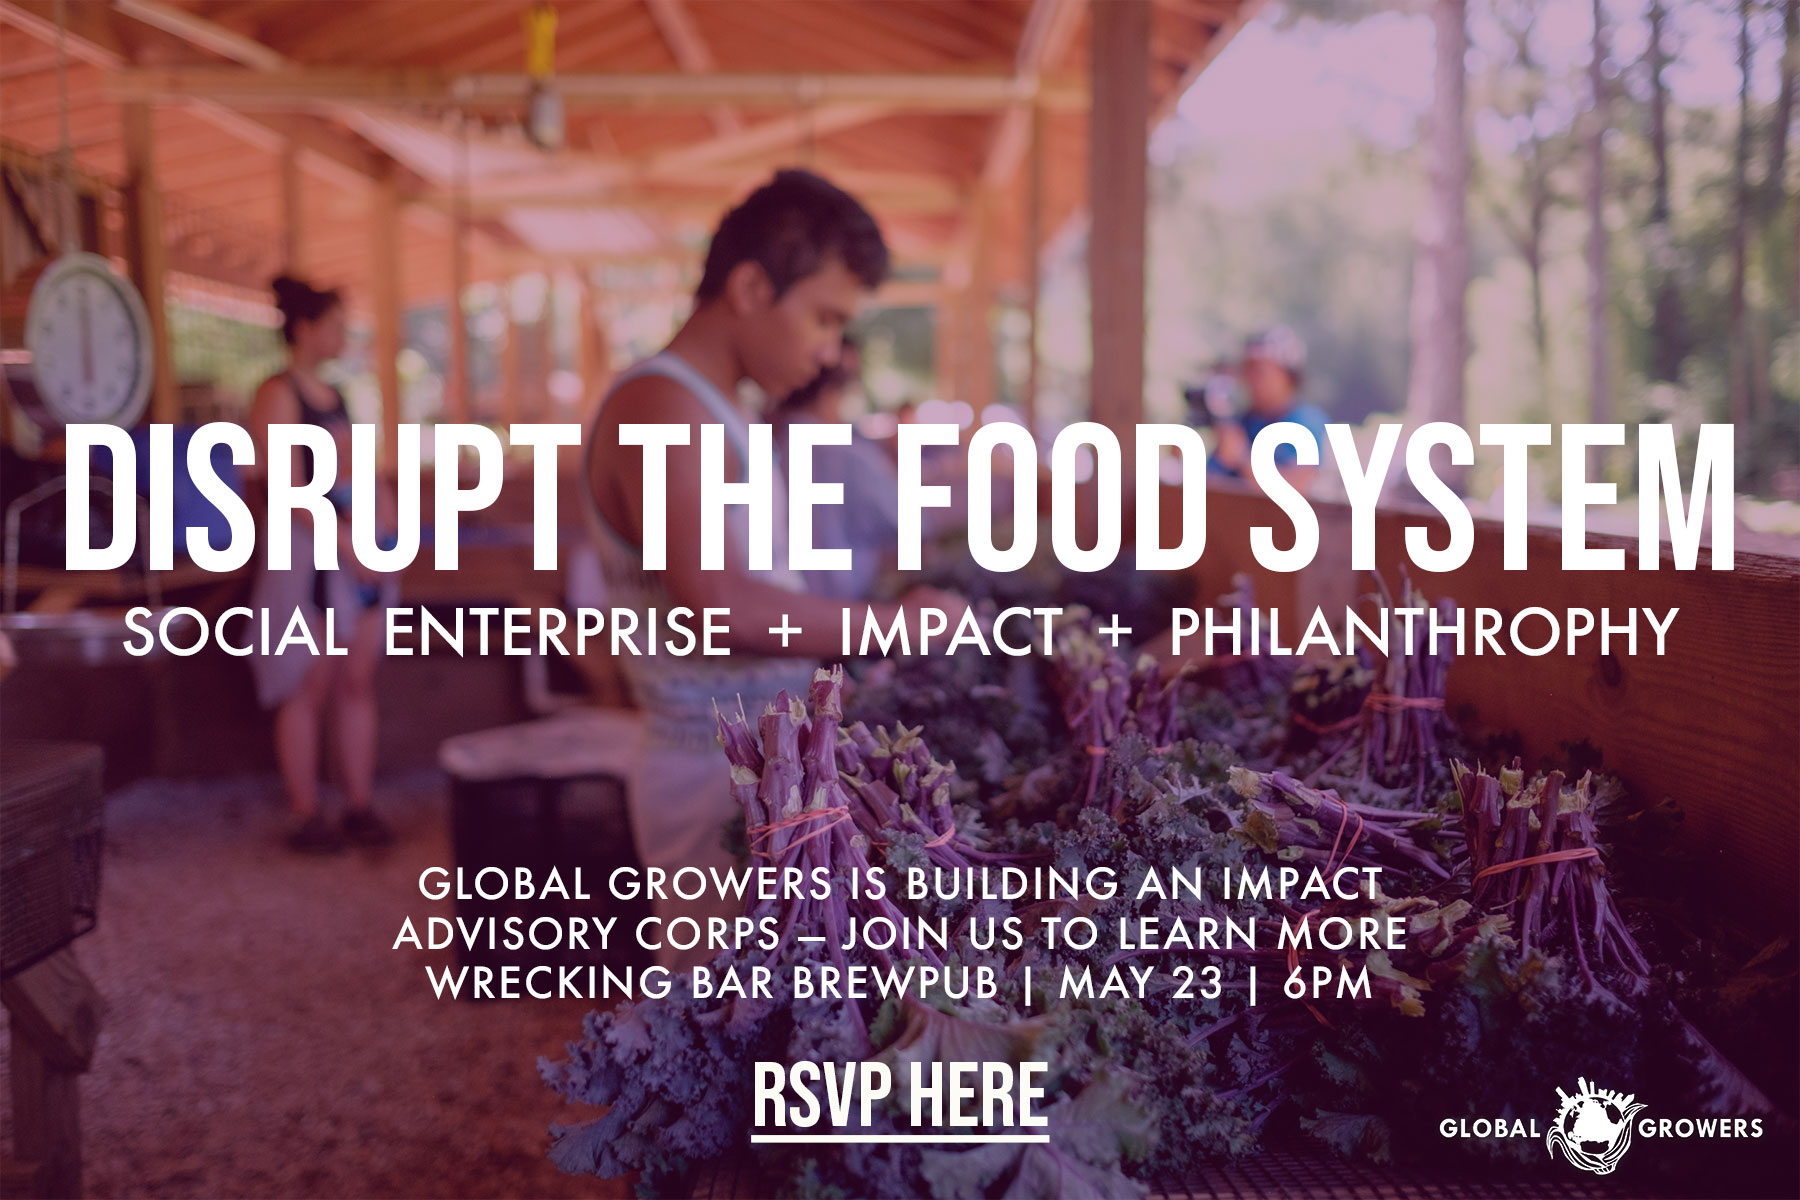 Impact-Advisory-Corps-Global-Growers.jpg